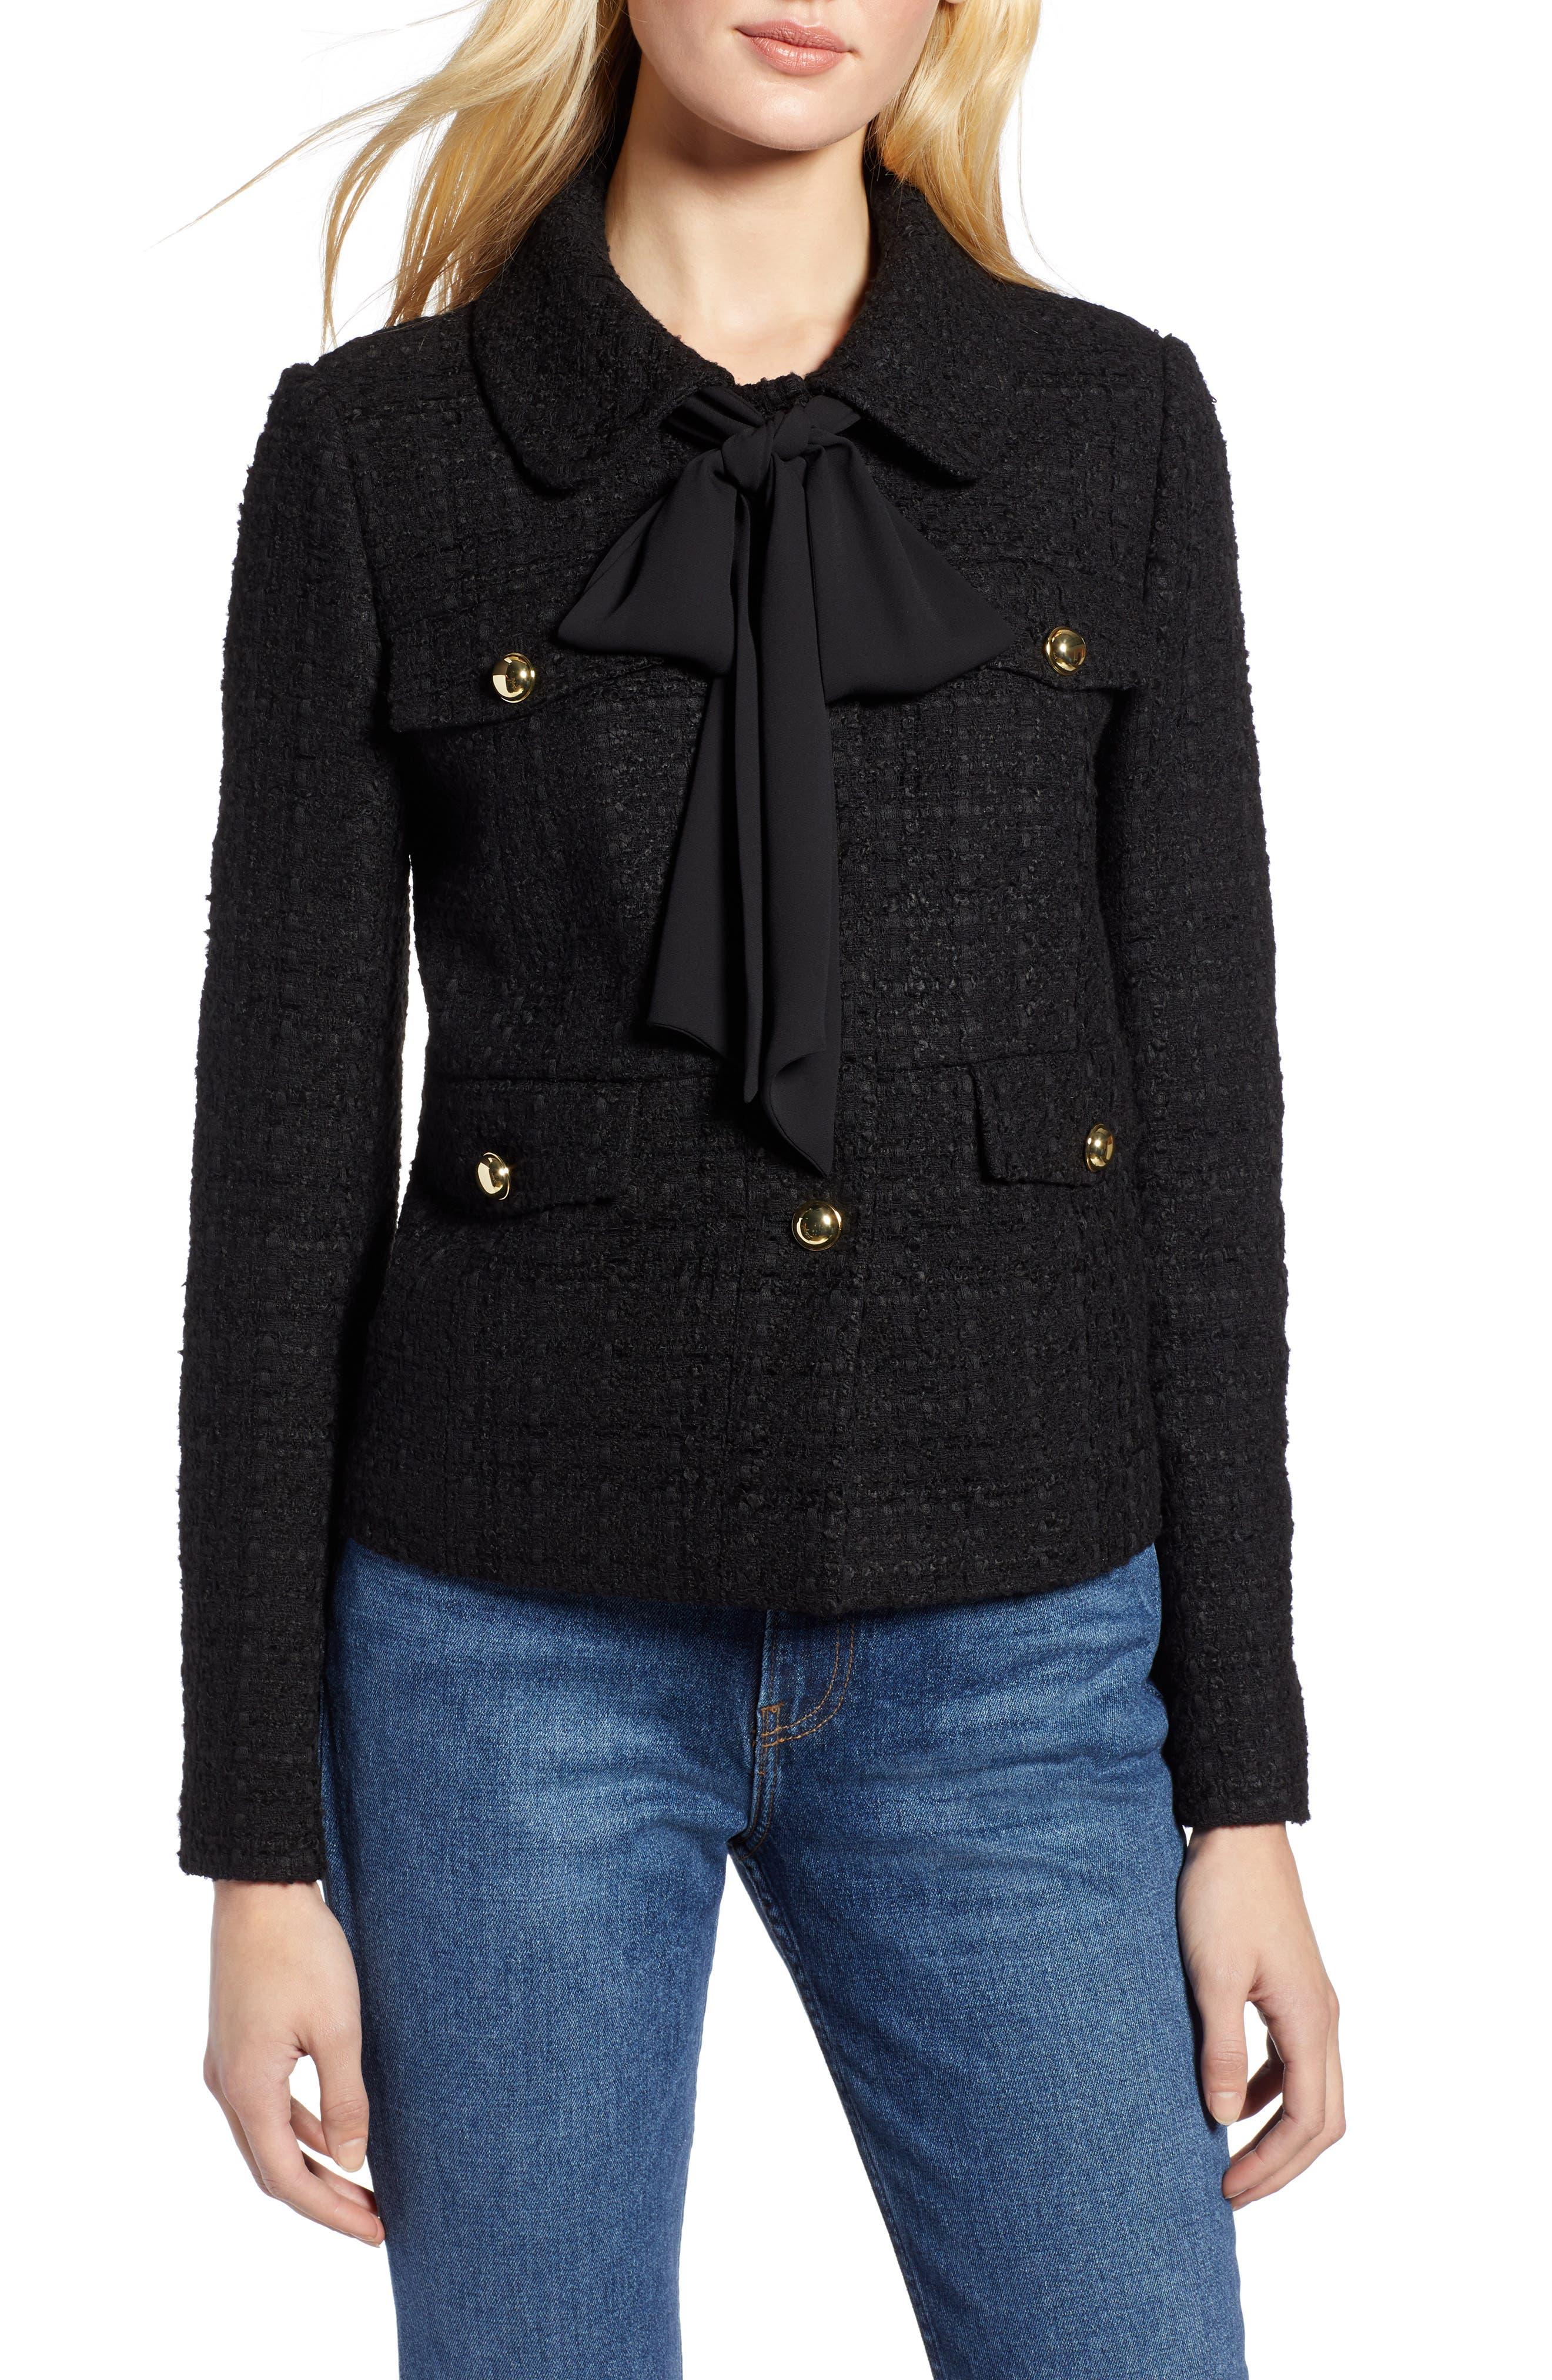 x Atlantic-Pacific Bow Detail Tweed Jacket,                             Main thumbnail 1, color,                             BLACK